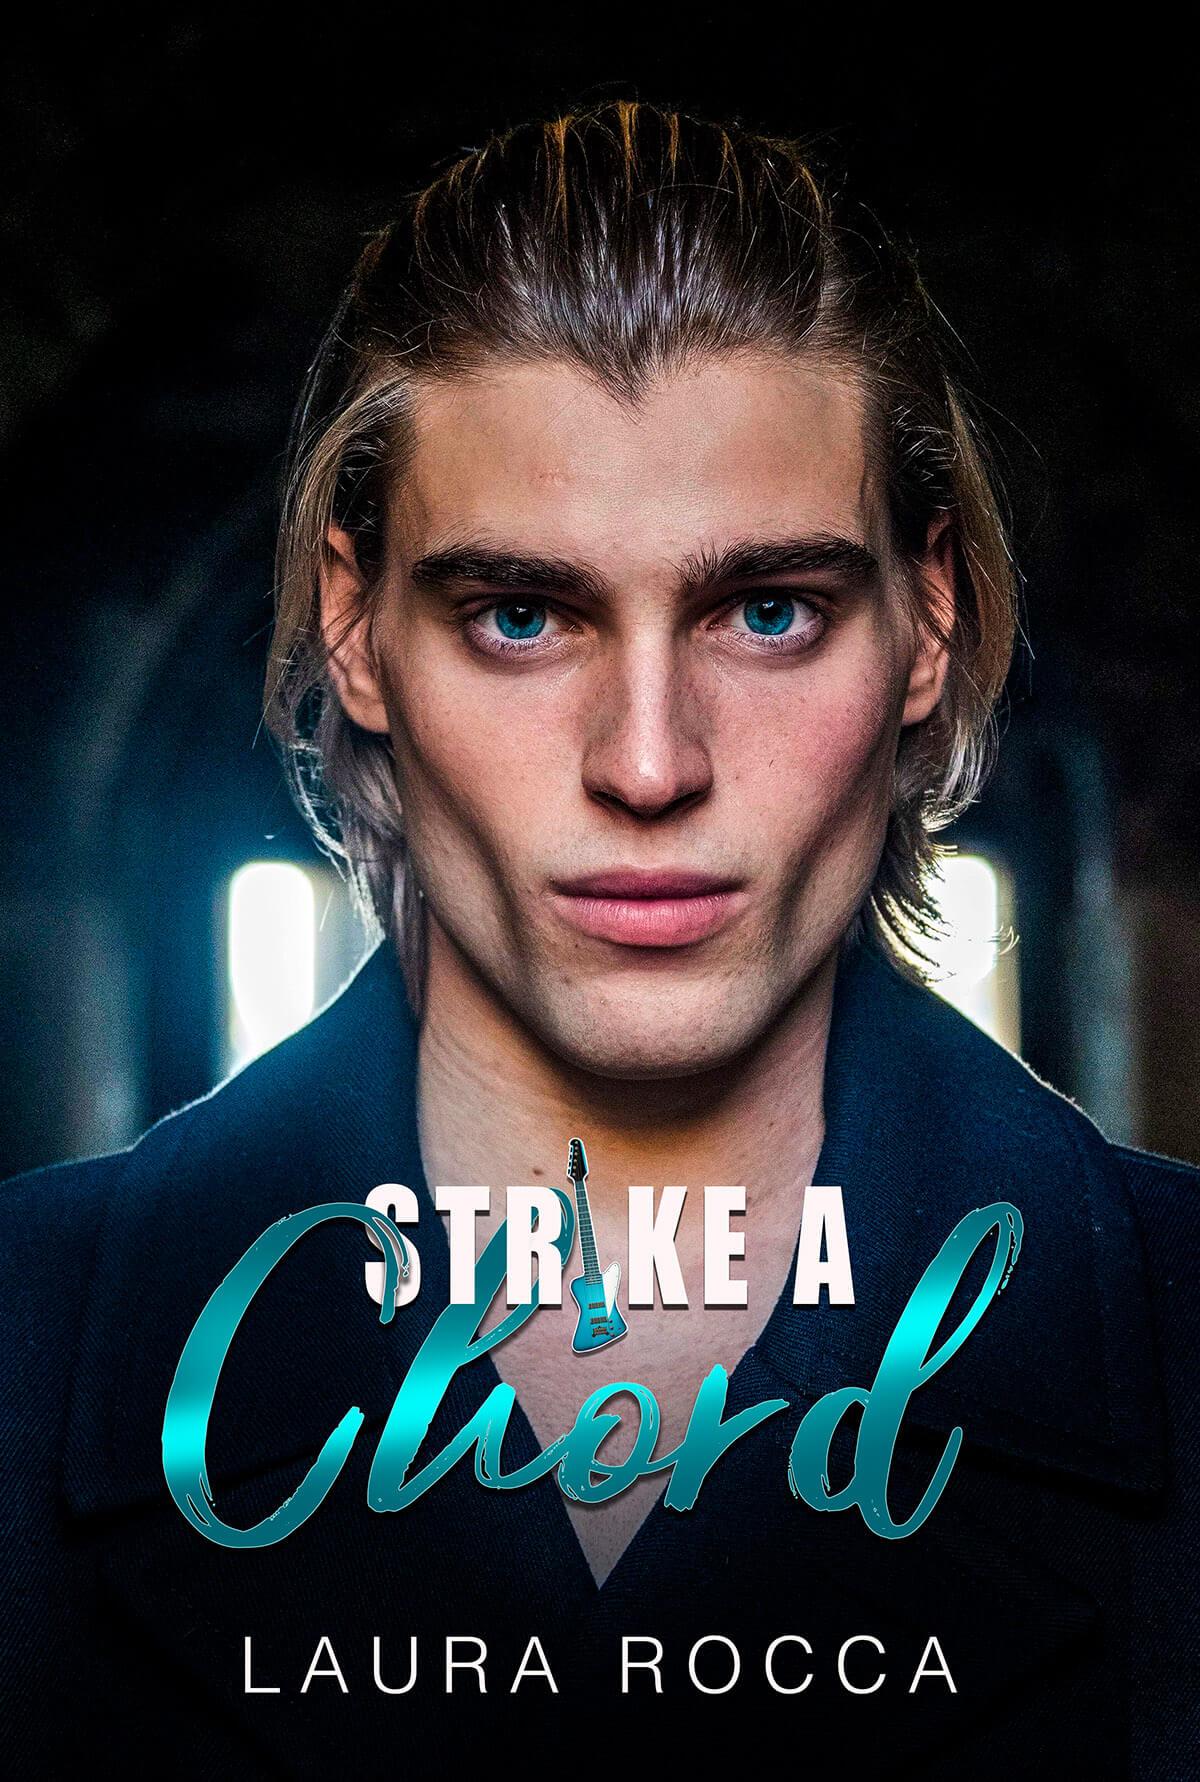 Strike a chord - romanzo rosa - Laura Rocca